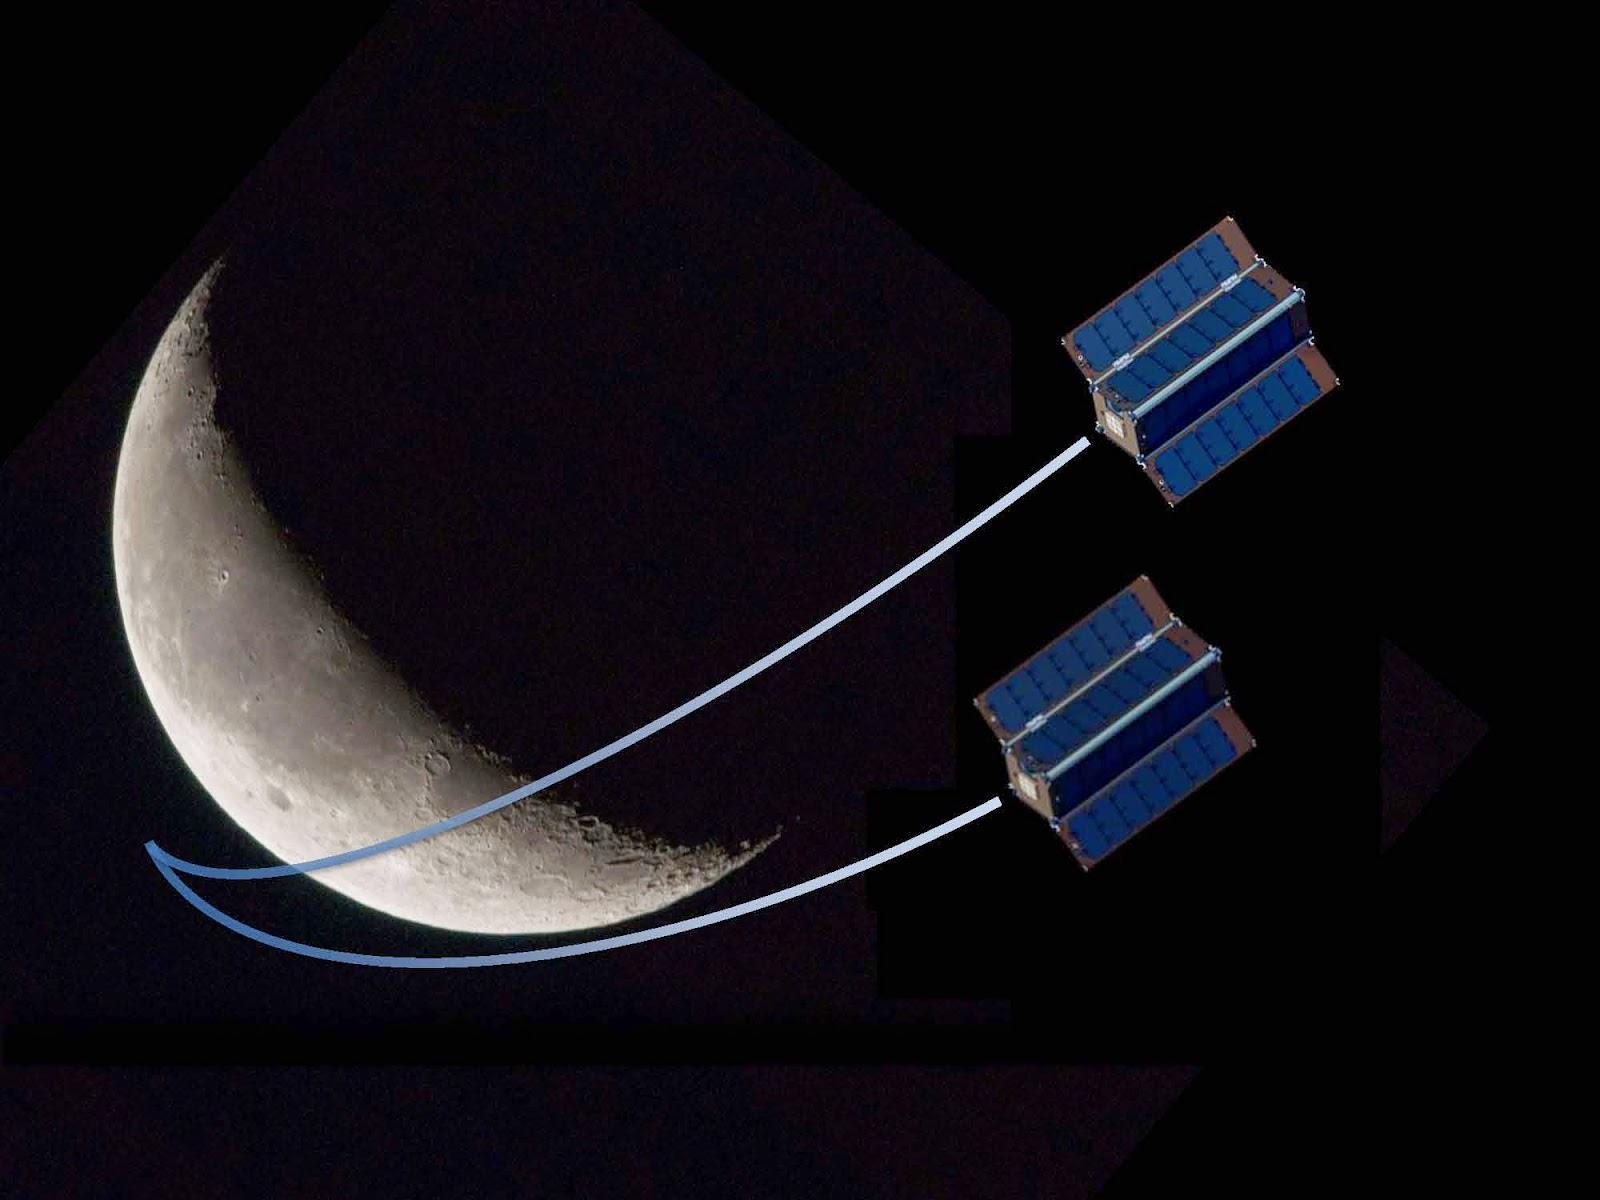 Tiny Moon Satellites